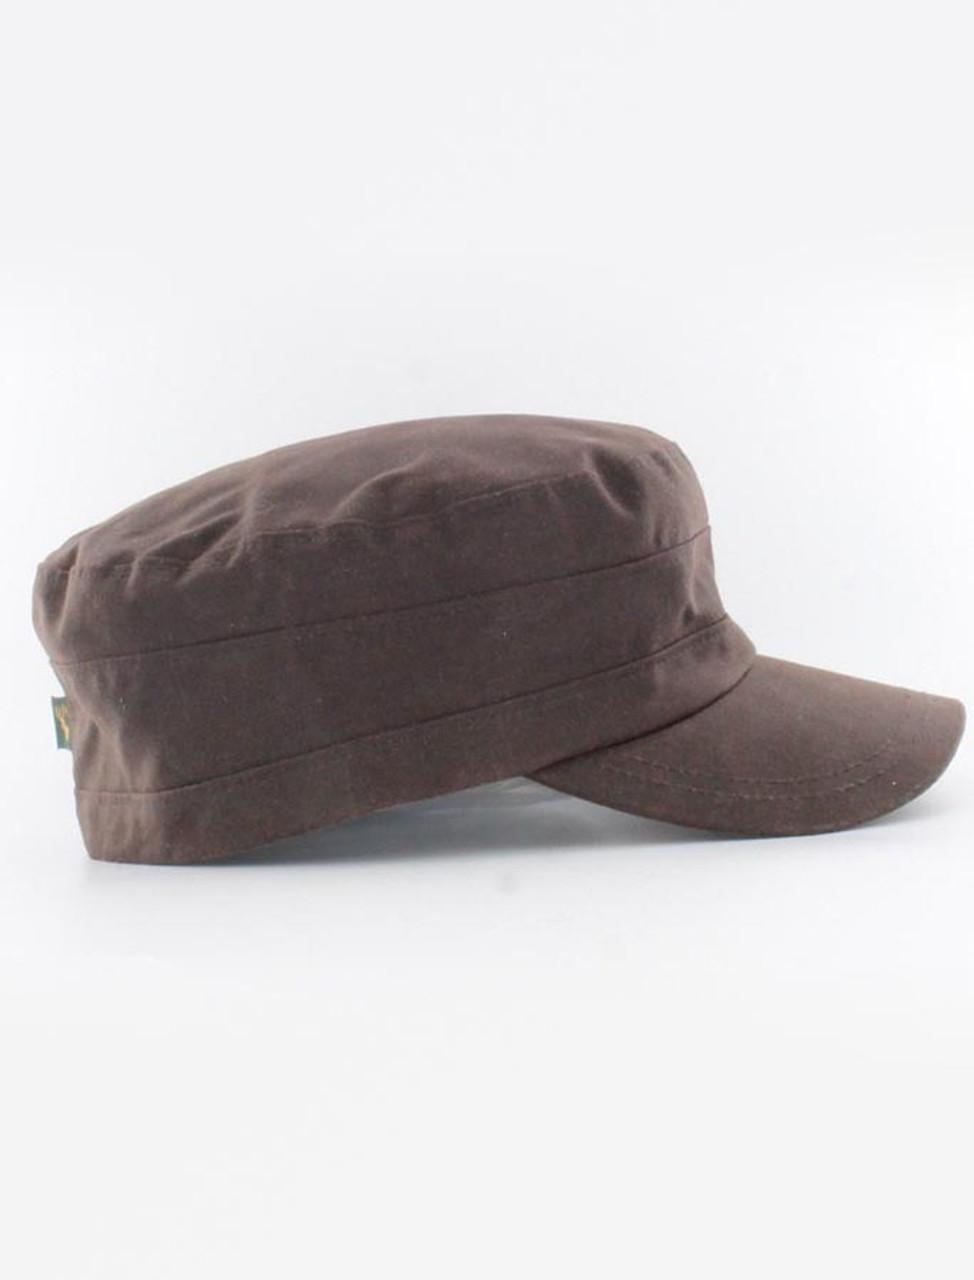 100bf71f36e Fisherman Waxed Cap - Brown